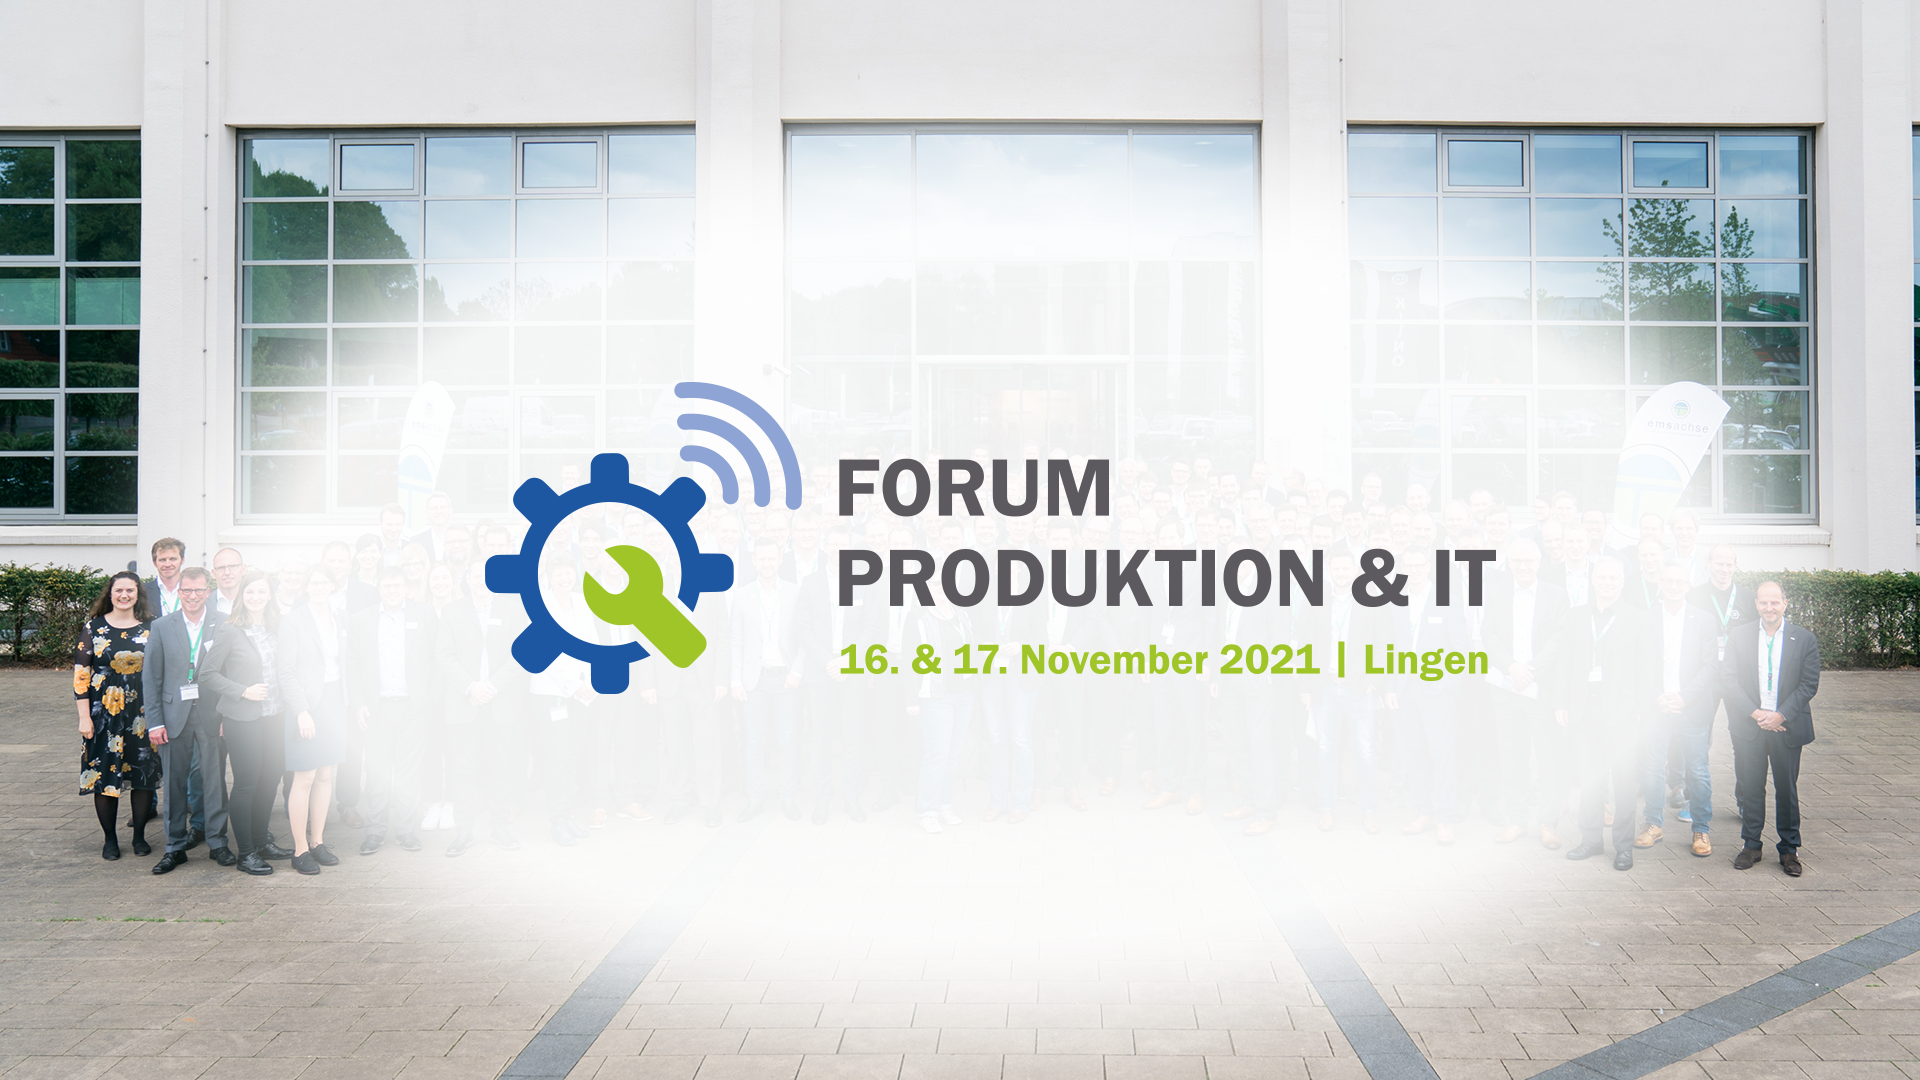 https://www.emsachse.de/storage/event/images/Fotos/2021/Forum_Produktion2021-11.png